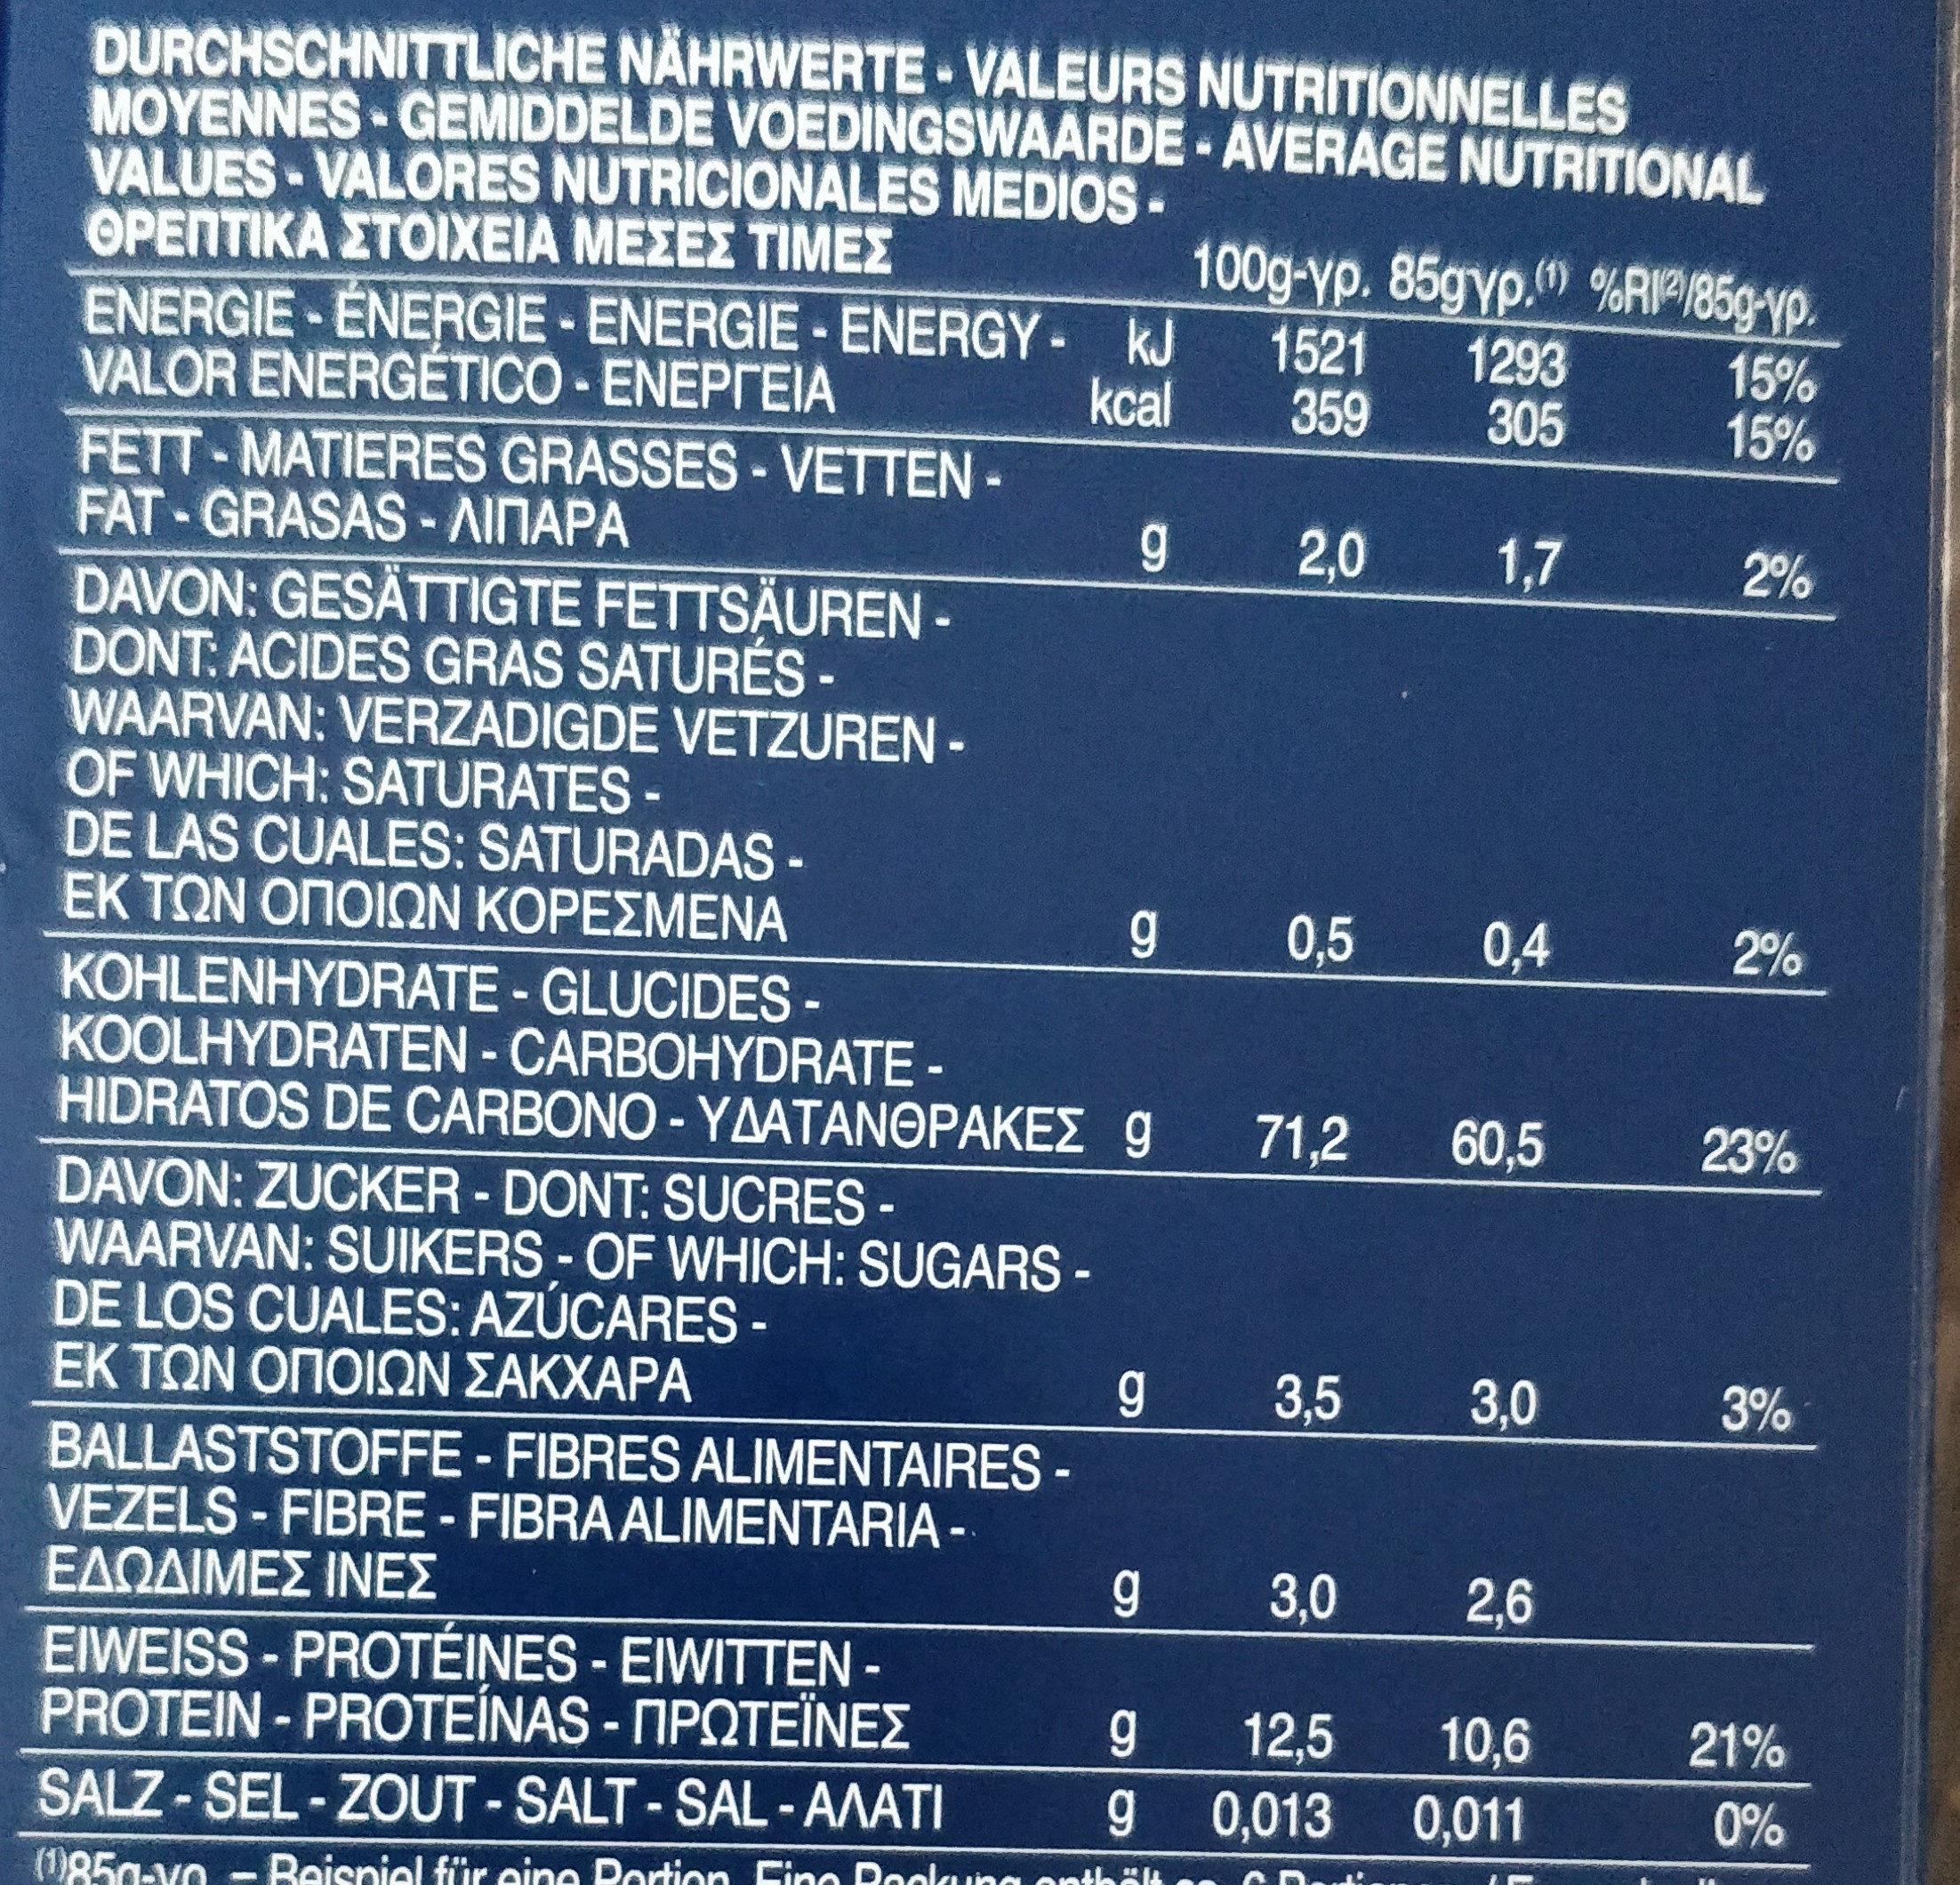 Penne lisce 500g imu eu - Valori nutrizionali - fr